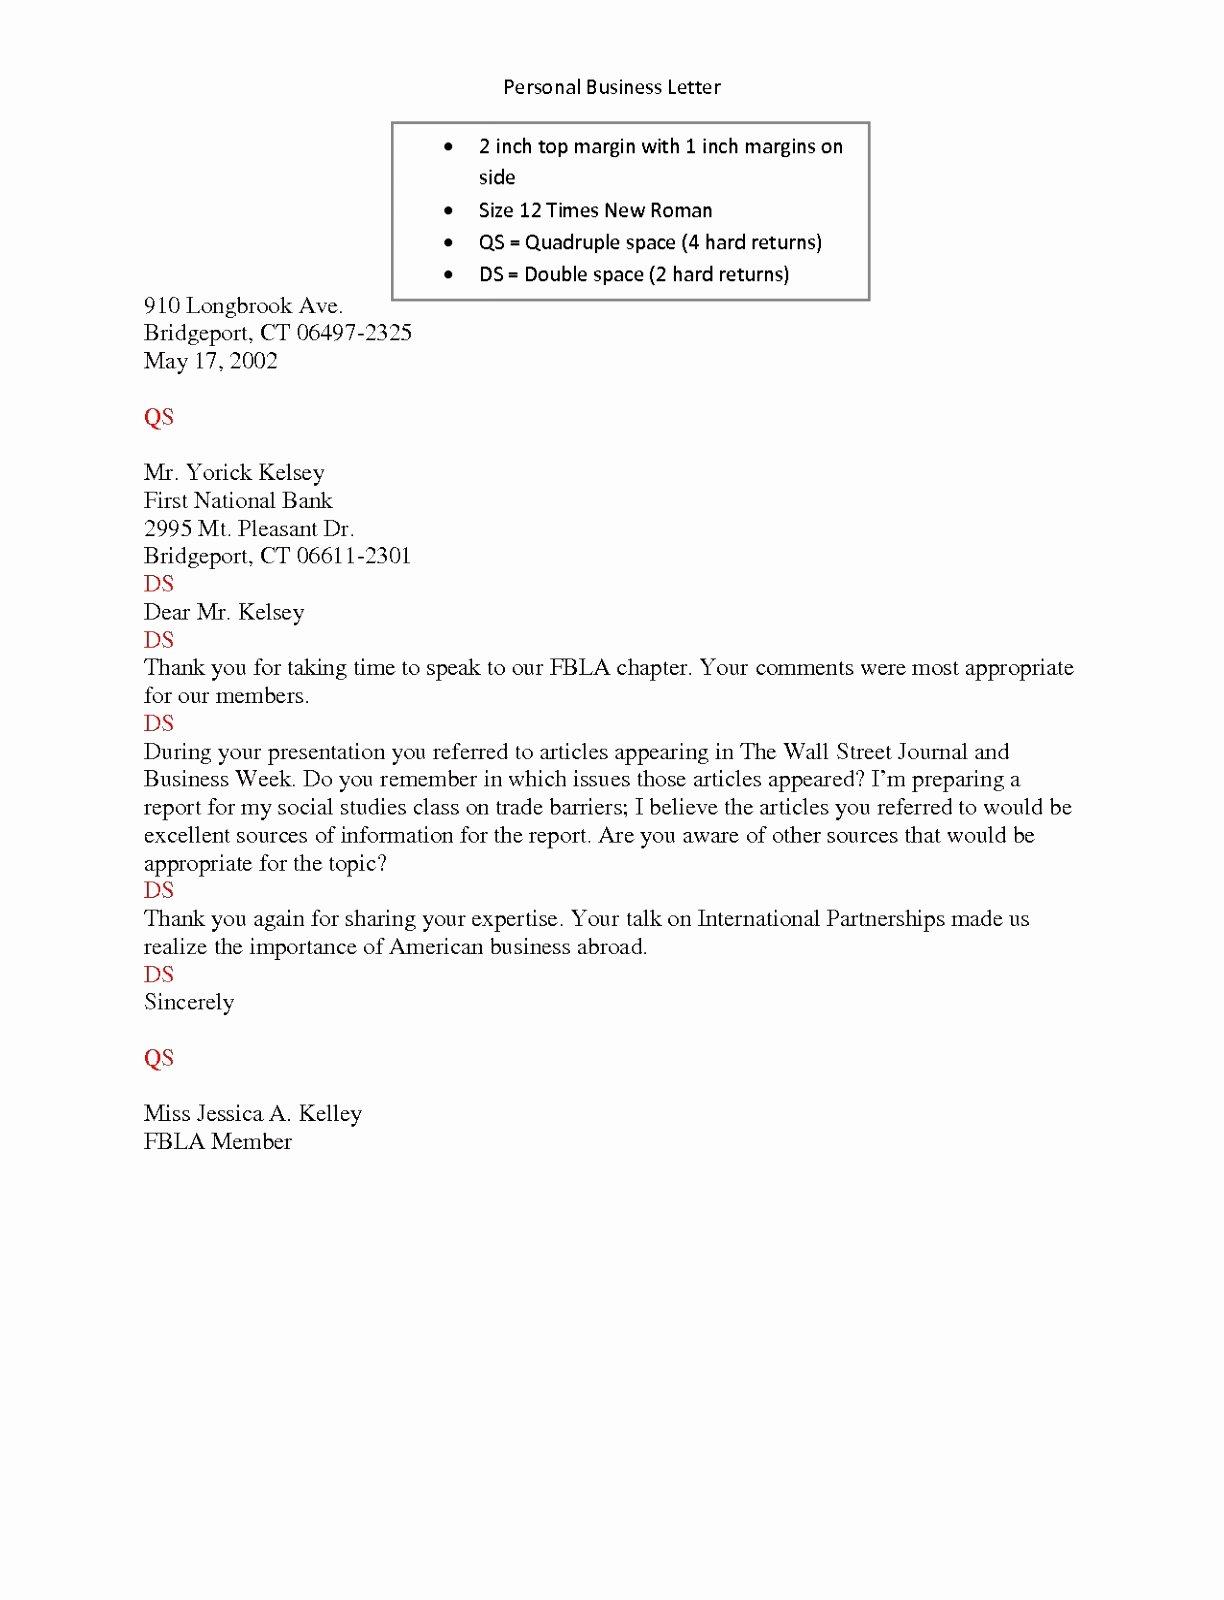 Letter Template Google Docs Elegant 6 Google Docs Business Letter Template Ieate